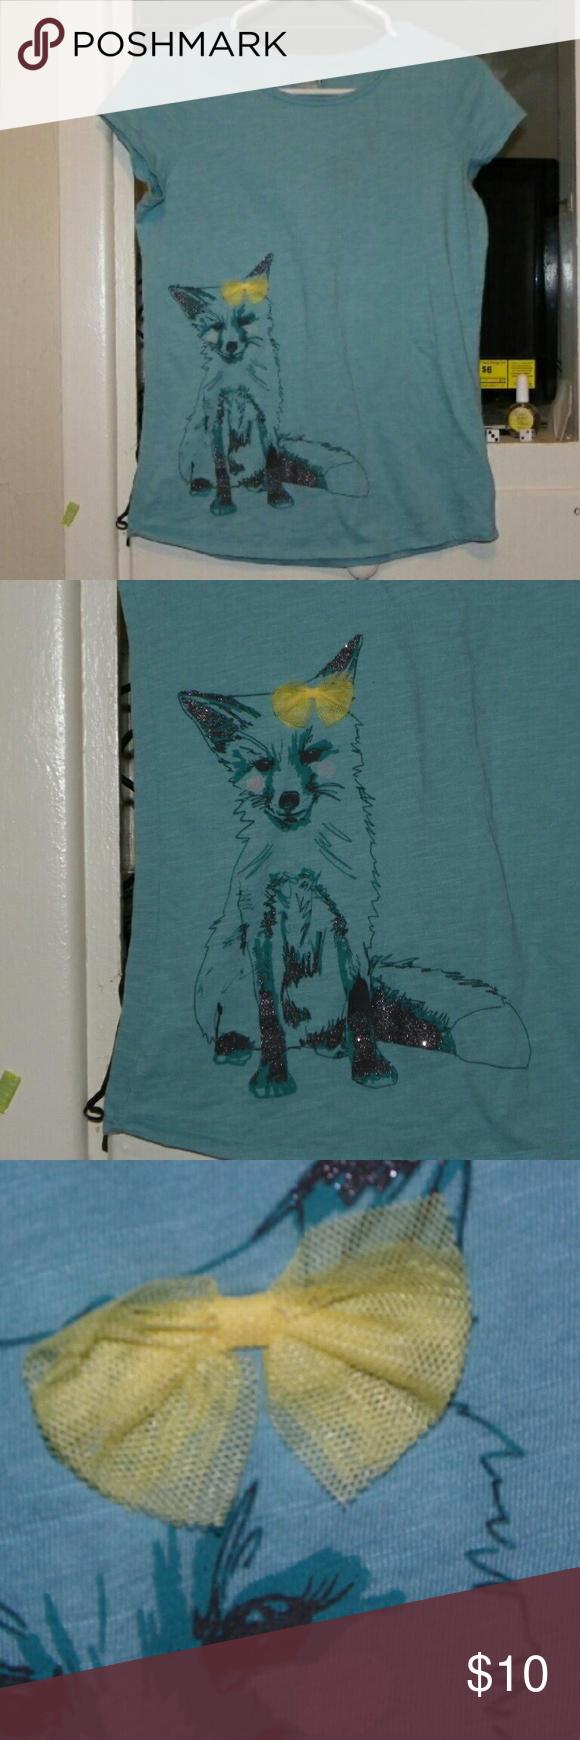 Fox Bow Tee Cute girls tee with fox and real bow Shirts & Tops Tees - Short Sleeve